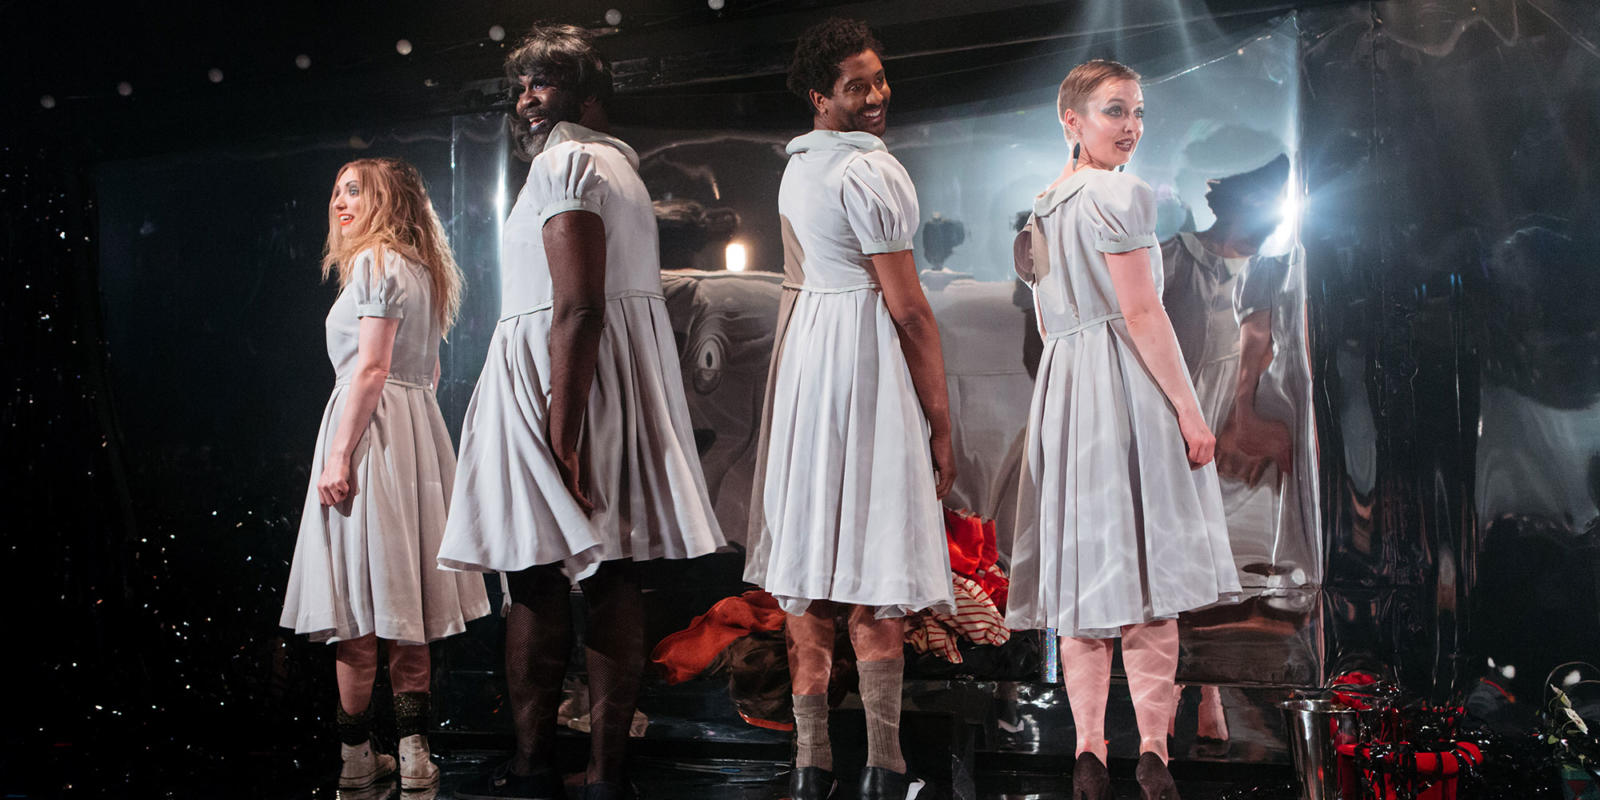 ENO and the Gate Theatre: Effigies of Wickednes Lucy McCormick, Le Gateau Chocolat, Peter Brathwaite, Katie Bray (c) Helen Murray.